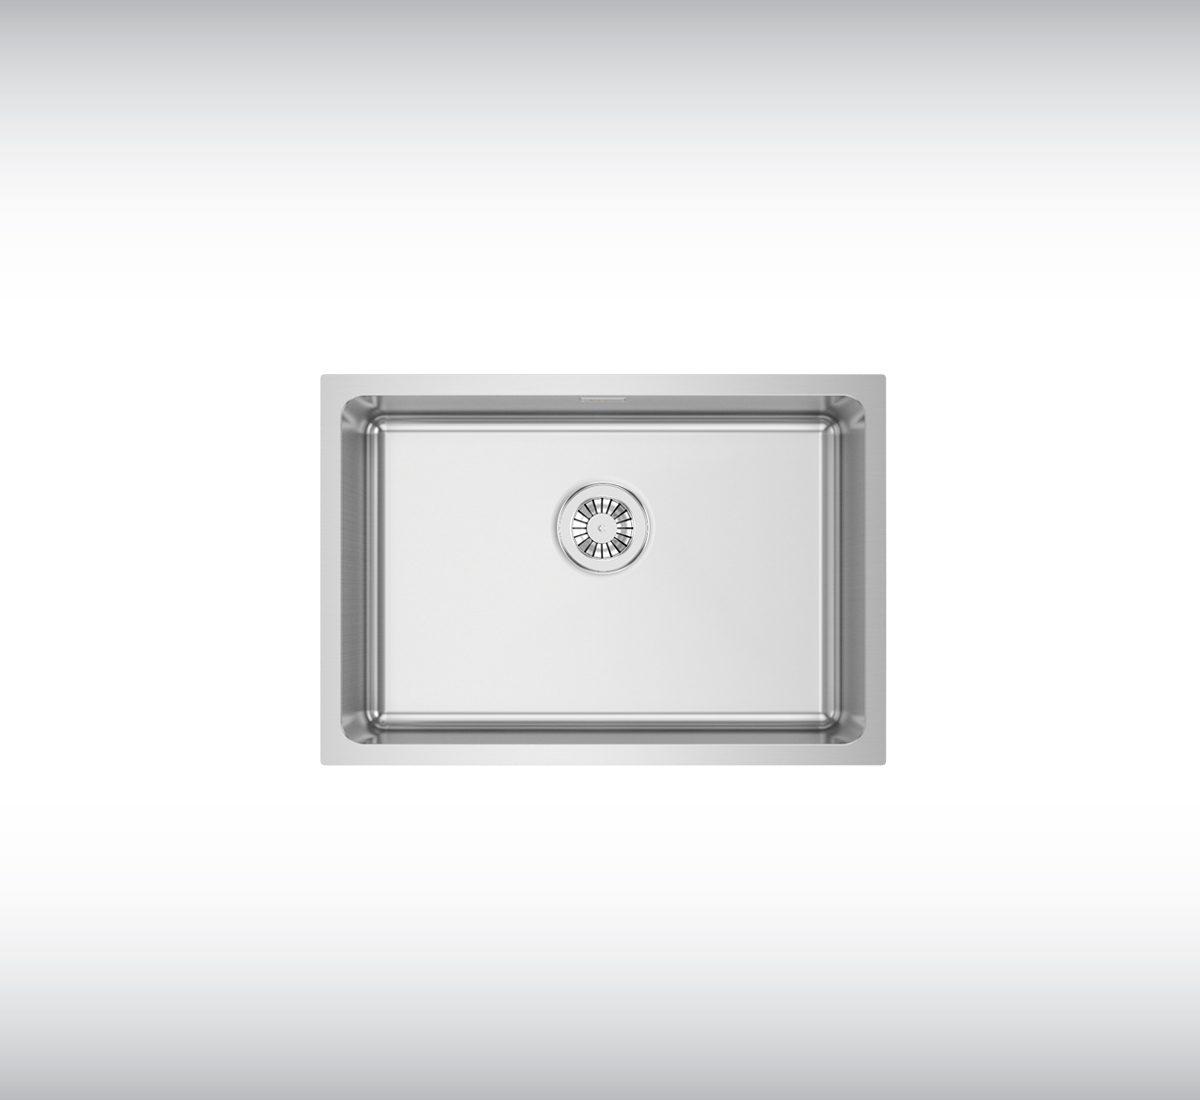 stainless steel sink UBSH-650